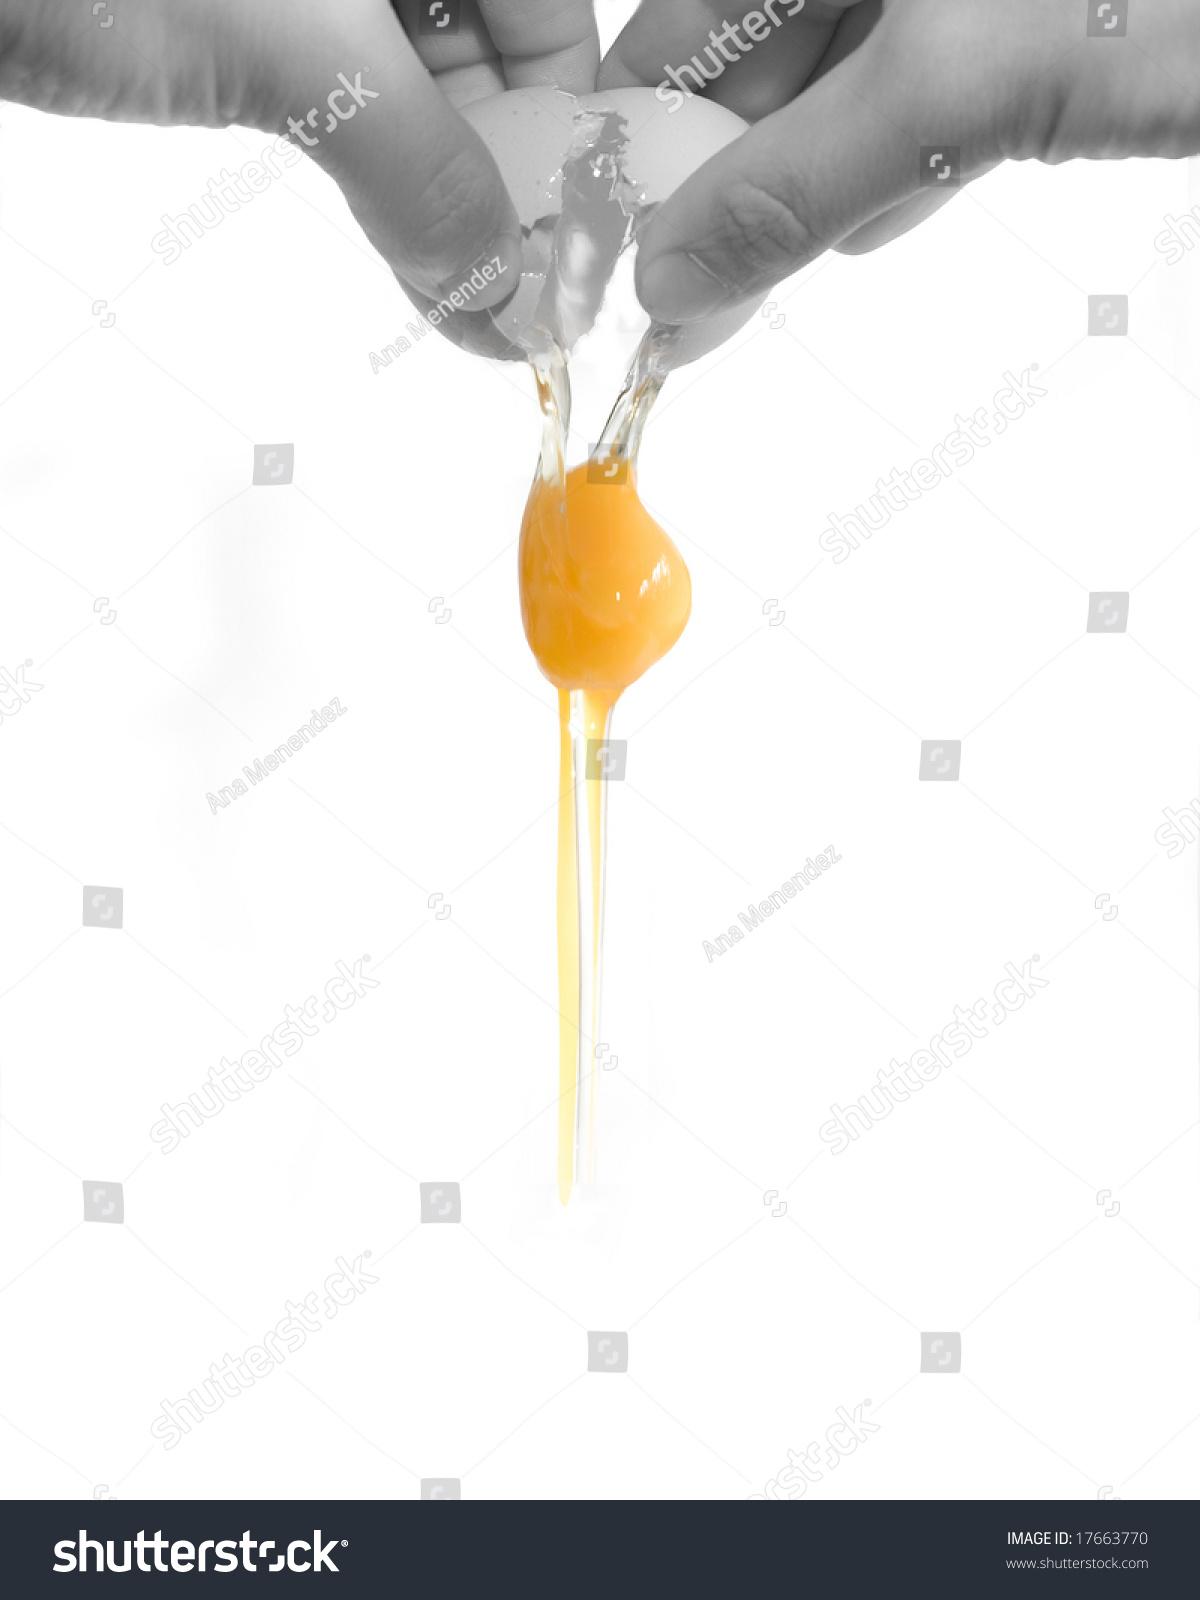 egg yolk falling -#main